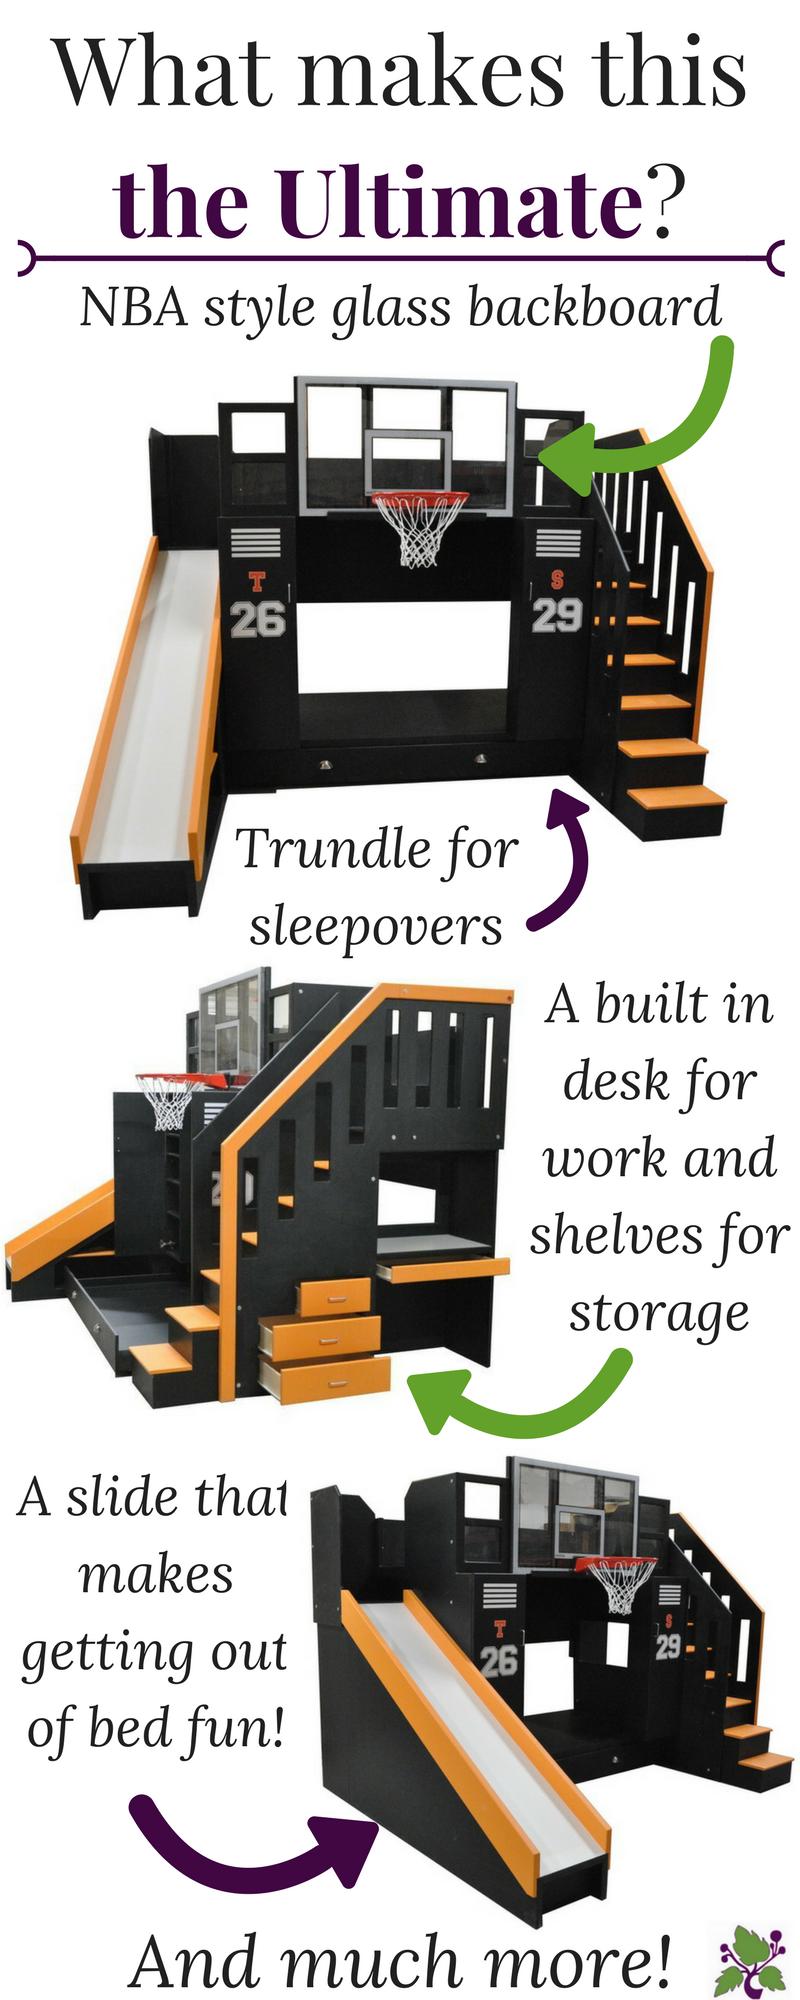 The Ultimate Basketball Bunk Bed Backboard Slide And More Basketball Room Basketball Bedroom Boys Bedrooms